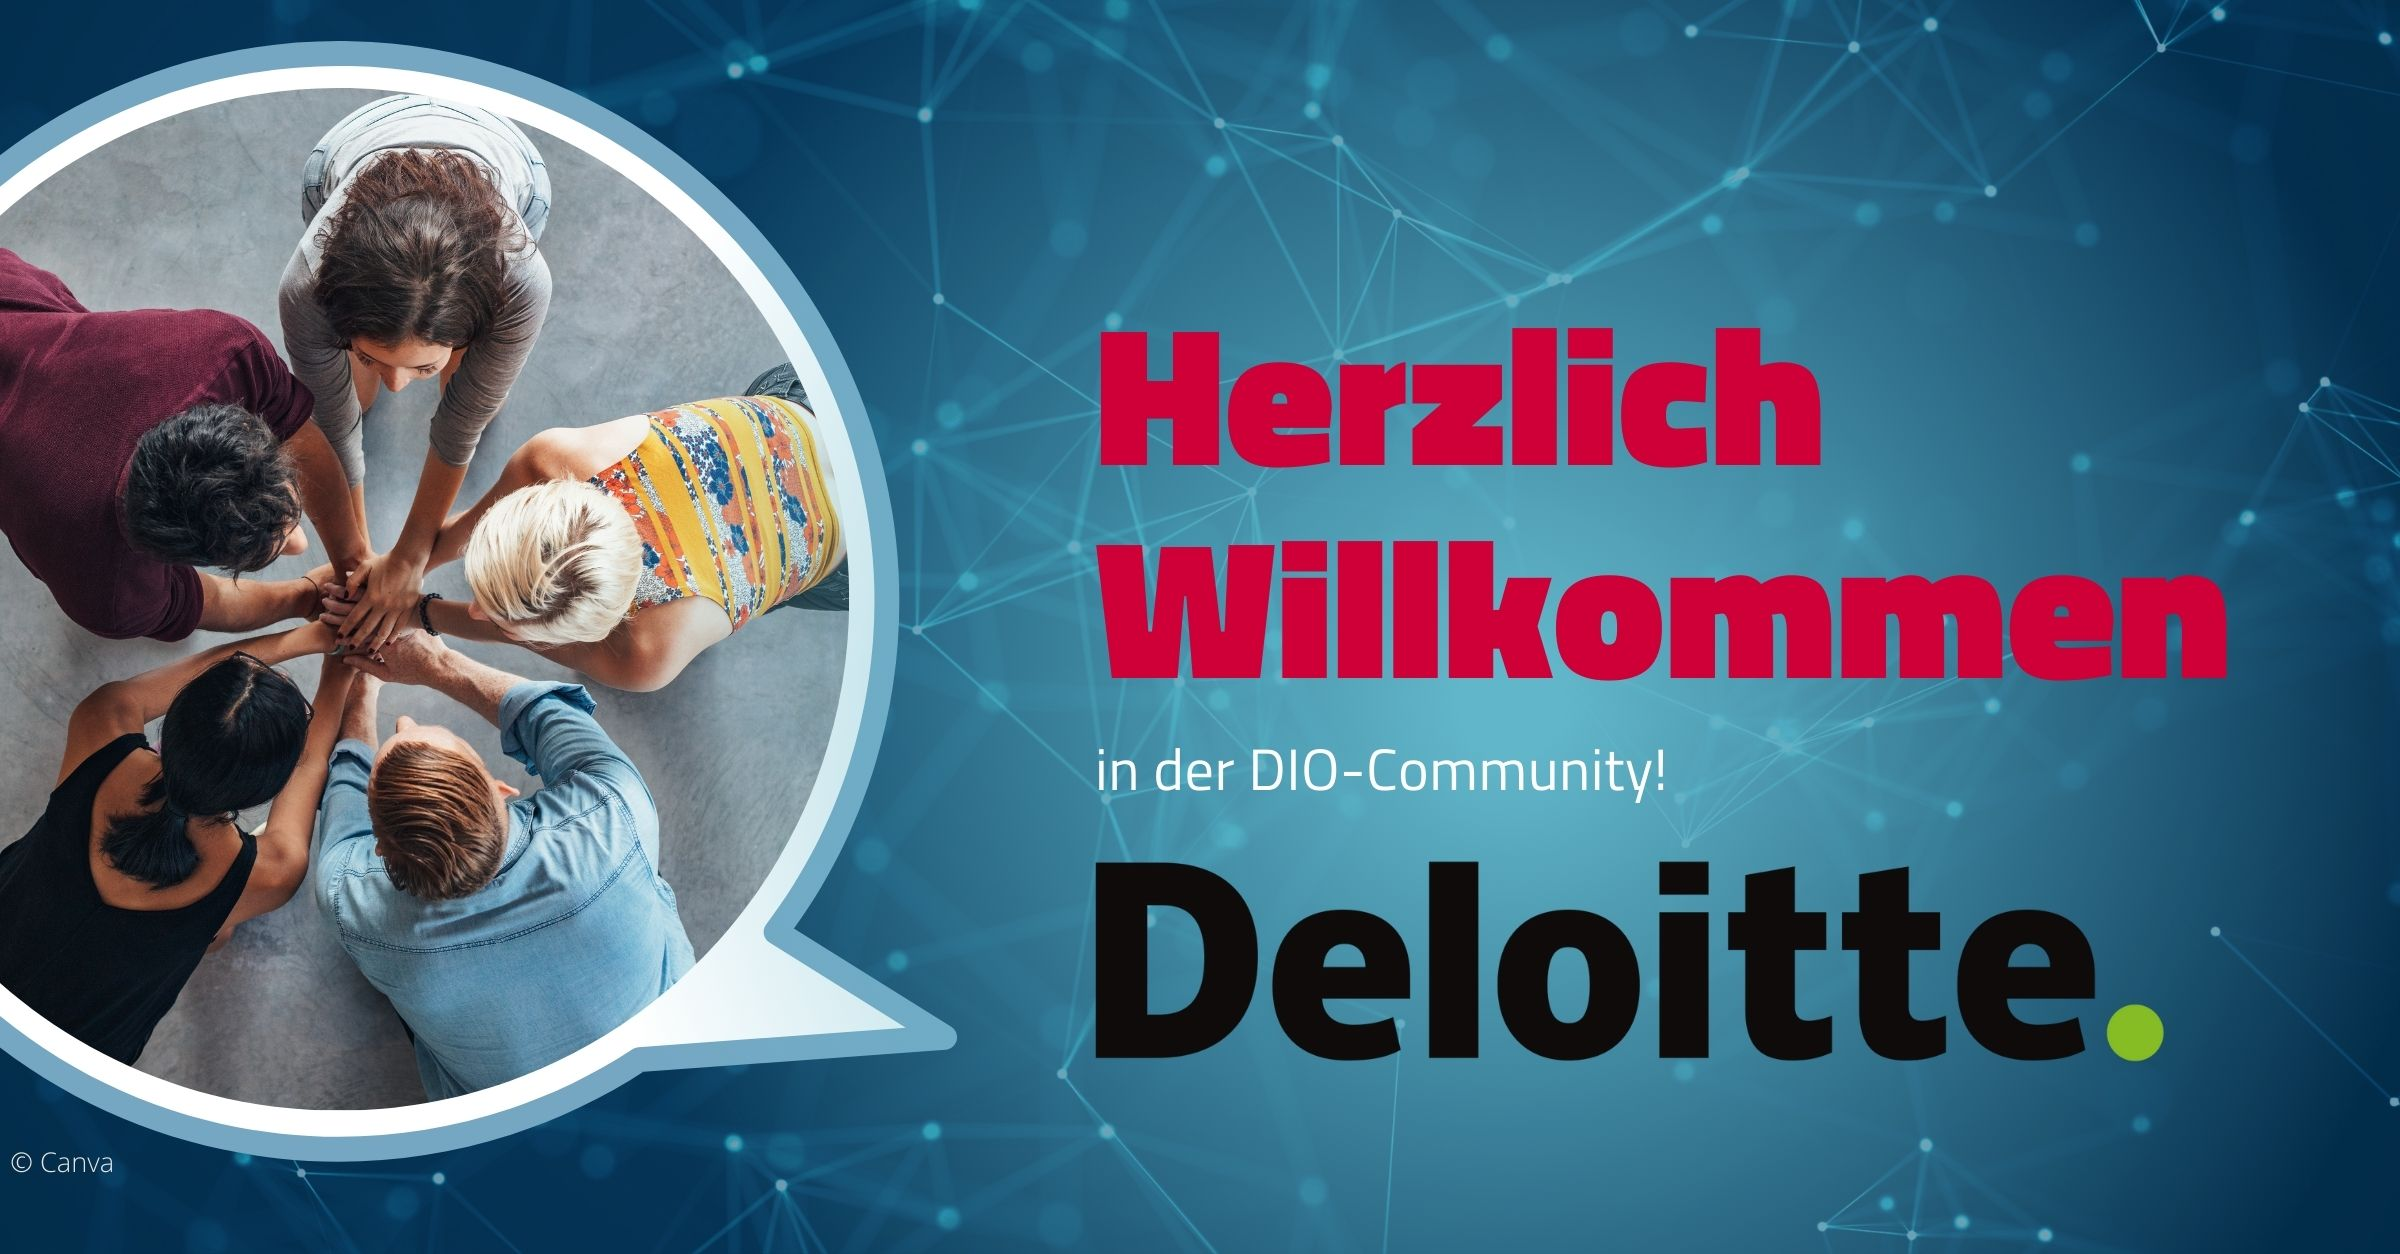 Herzlich Willkommen Deloitte